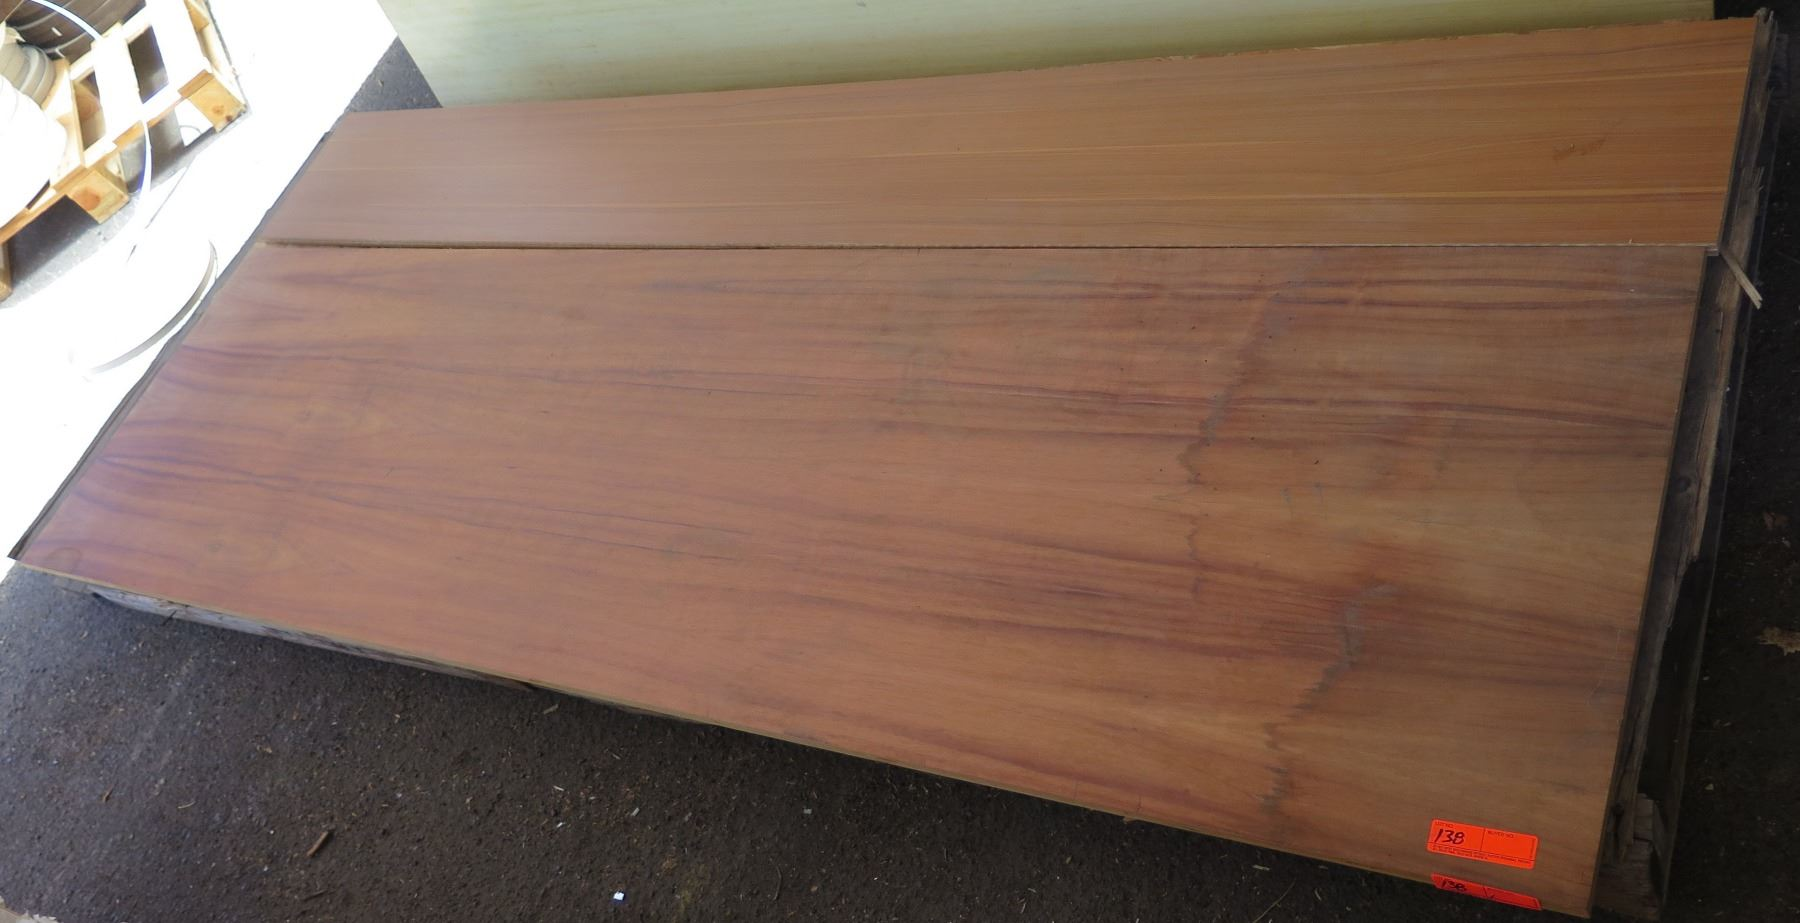 Qty 2 Koa Wood Veneer Florentine Rosewood Melamine Plywood